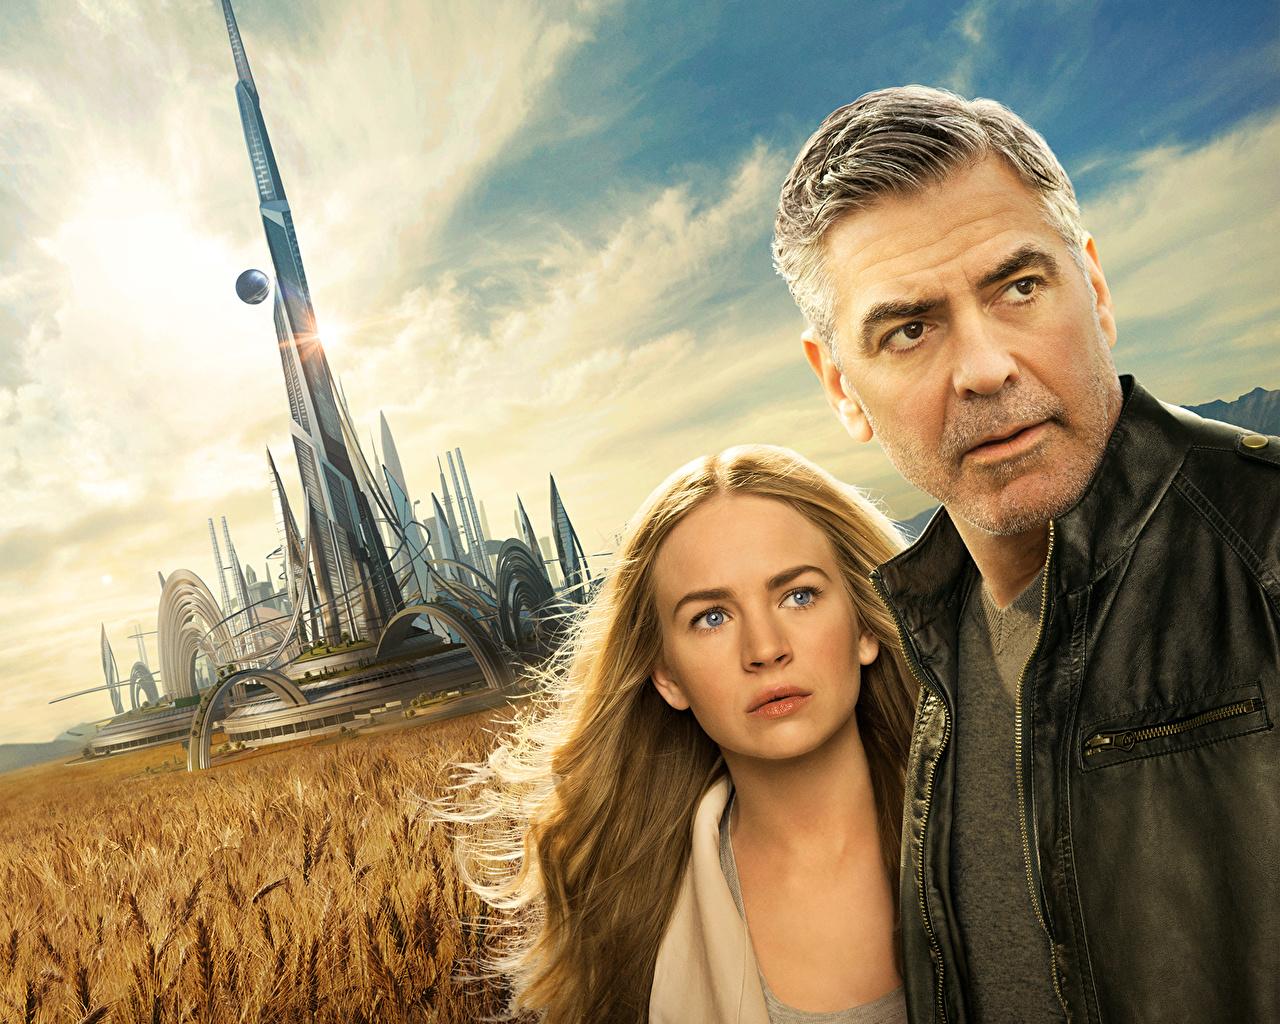 Photos George Clooney Blonde girl Men Tomorrowland Britt Robertson 1280x1024